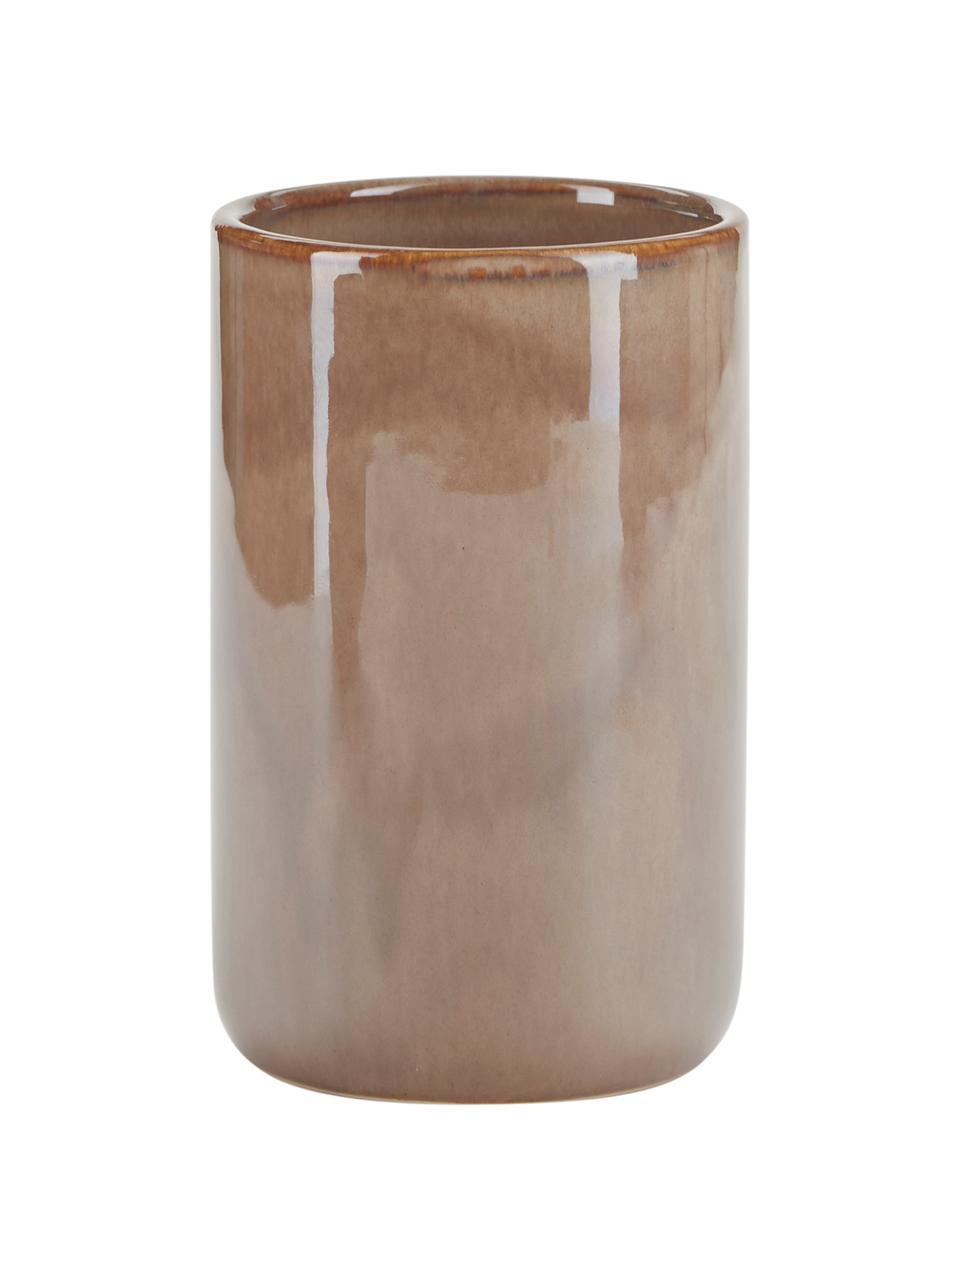 Tandenborstelbeker Tin van keramiek in bruin, Keramiek, Bruin, Ø 8 x H 12 cm